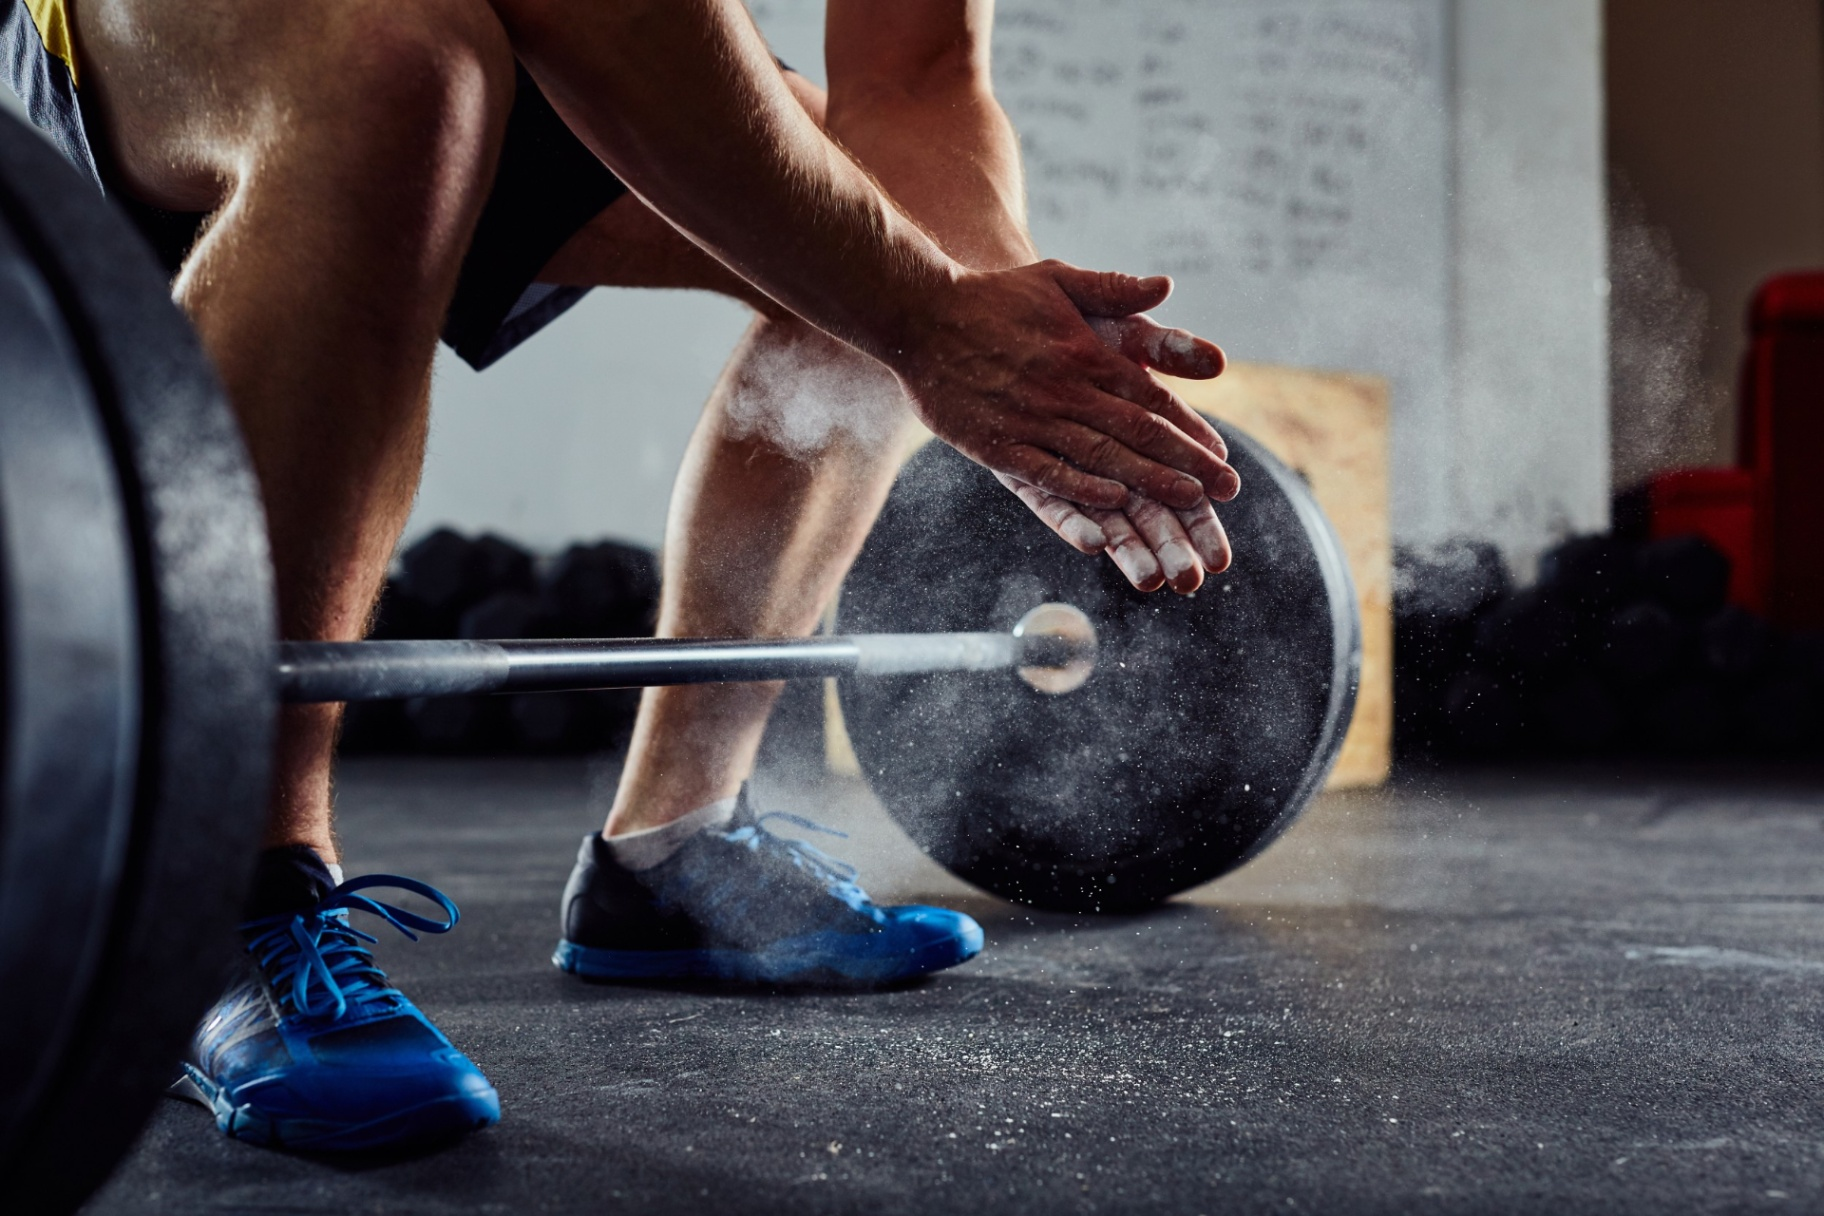 Fisiculturismo: entenda tudo sobre esta prática esportiva